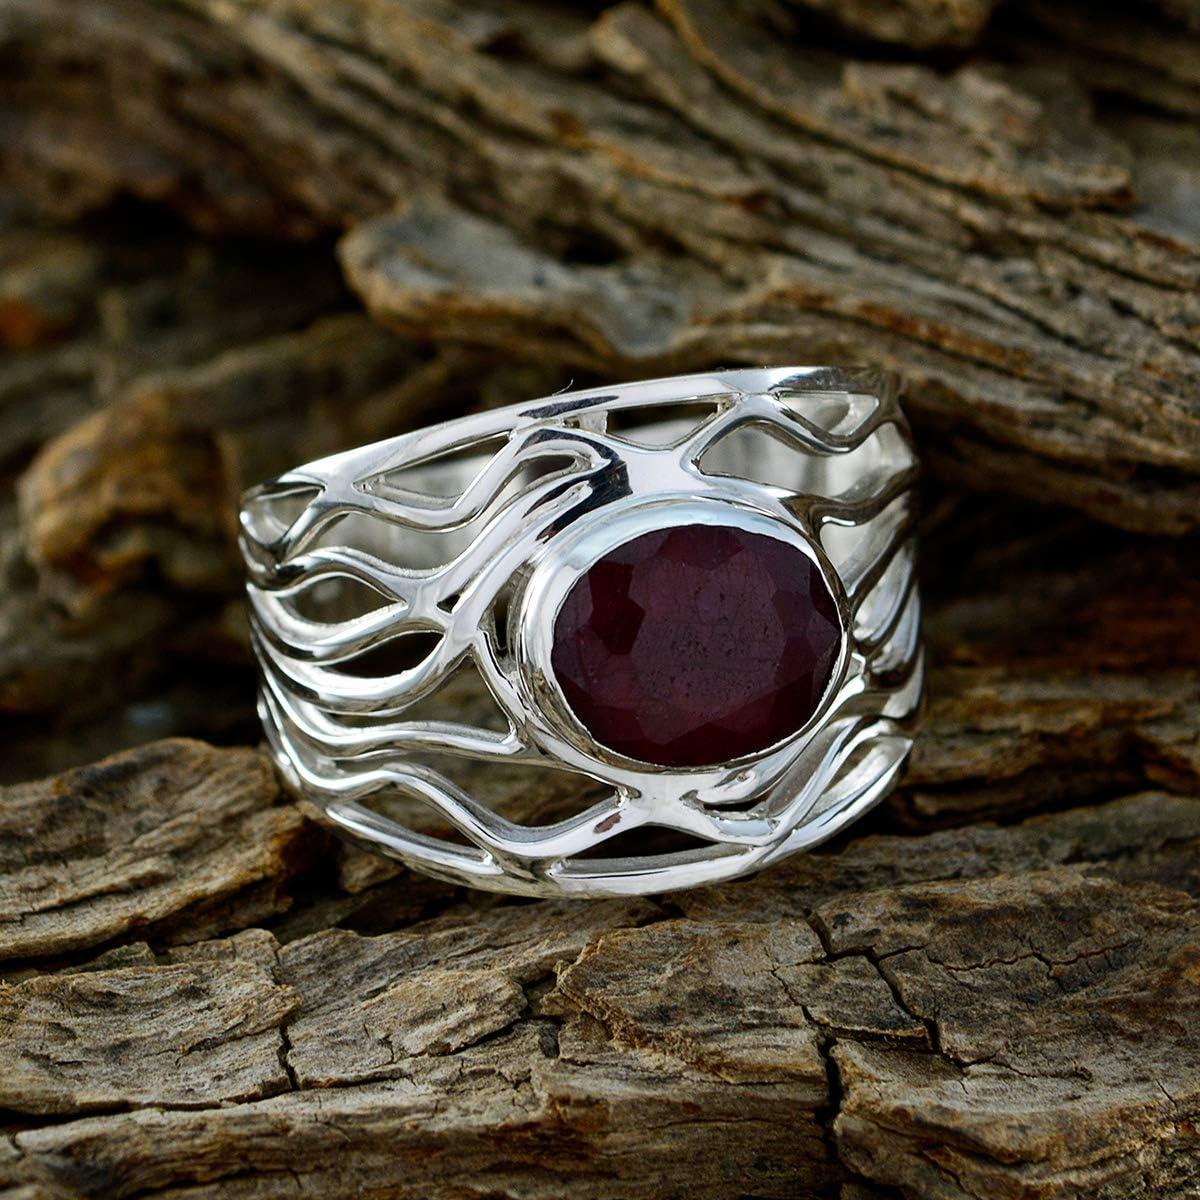 Cushion Shape Jasper Ring Handmade Jewellery Gemstone Gift For Her 925 Sterling Silver Plated Ring Gemstone Red Jasper Carving Ring